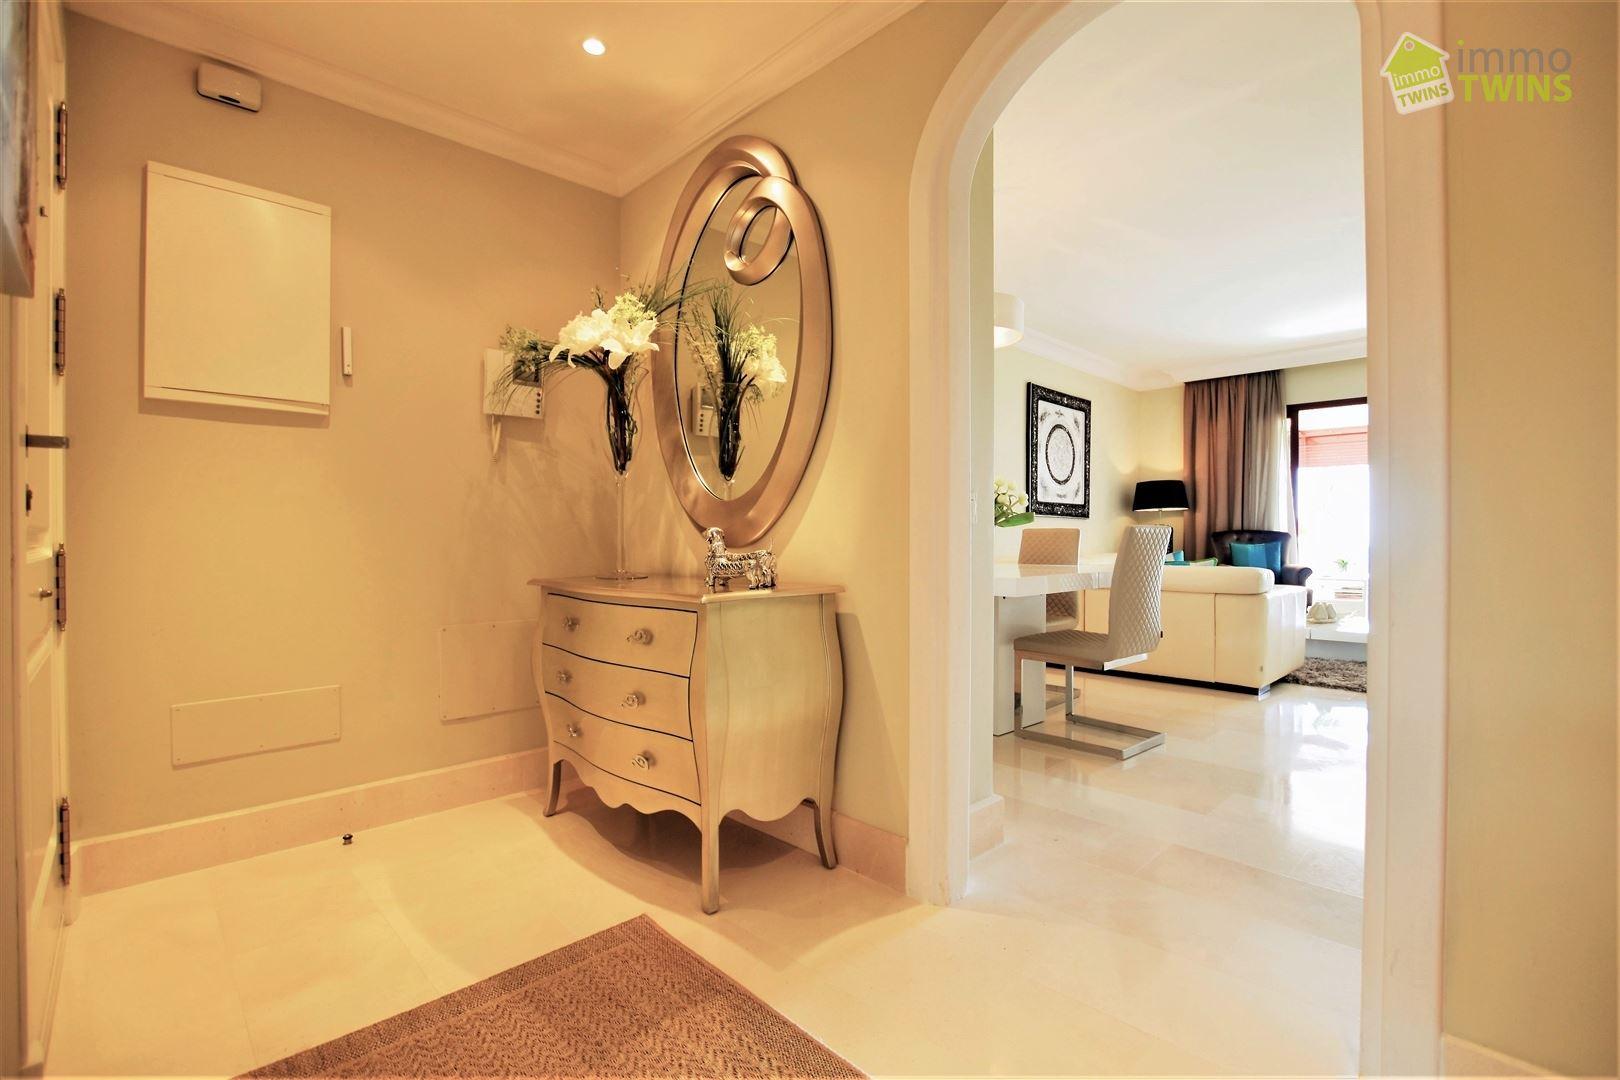 Foto 2 : Appartement te 29679 MARBELLA (Spanje) - Prijs € 485.000